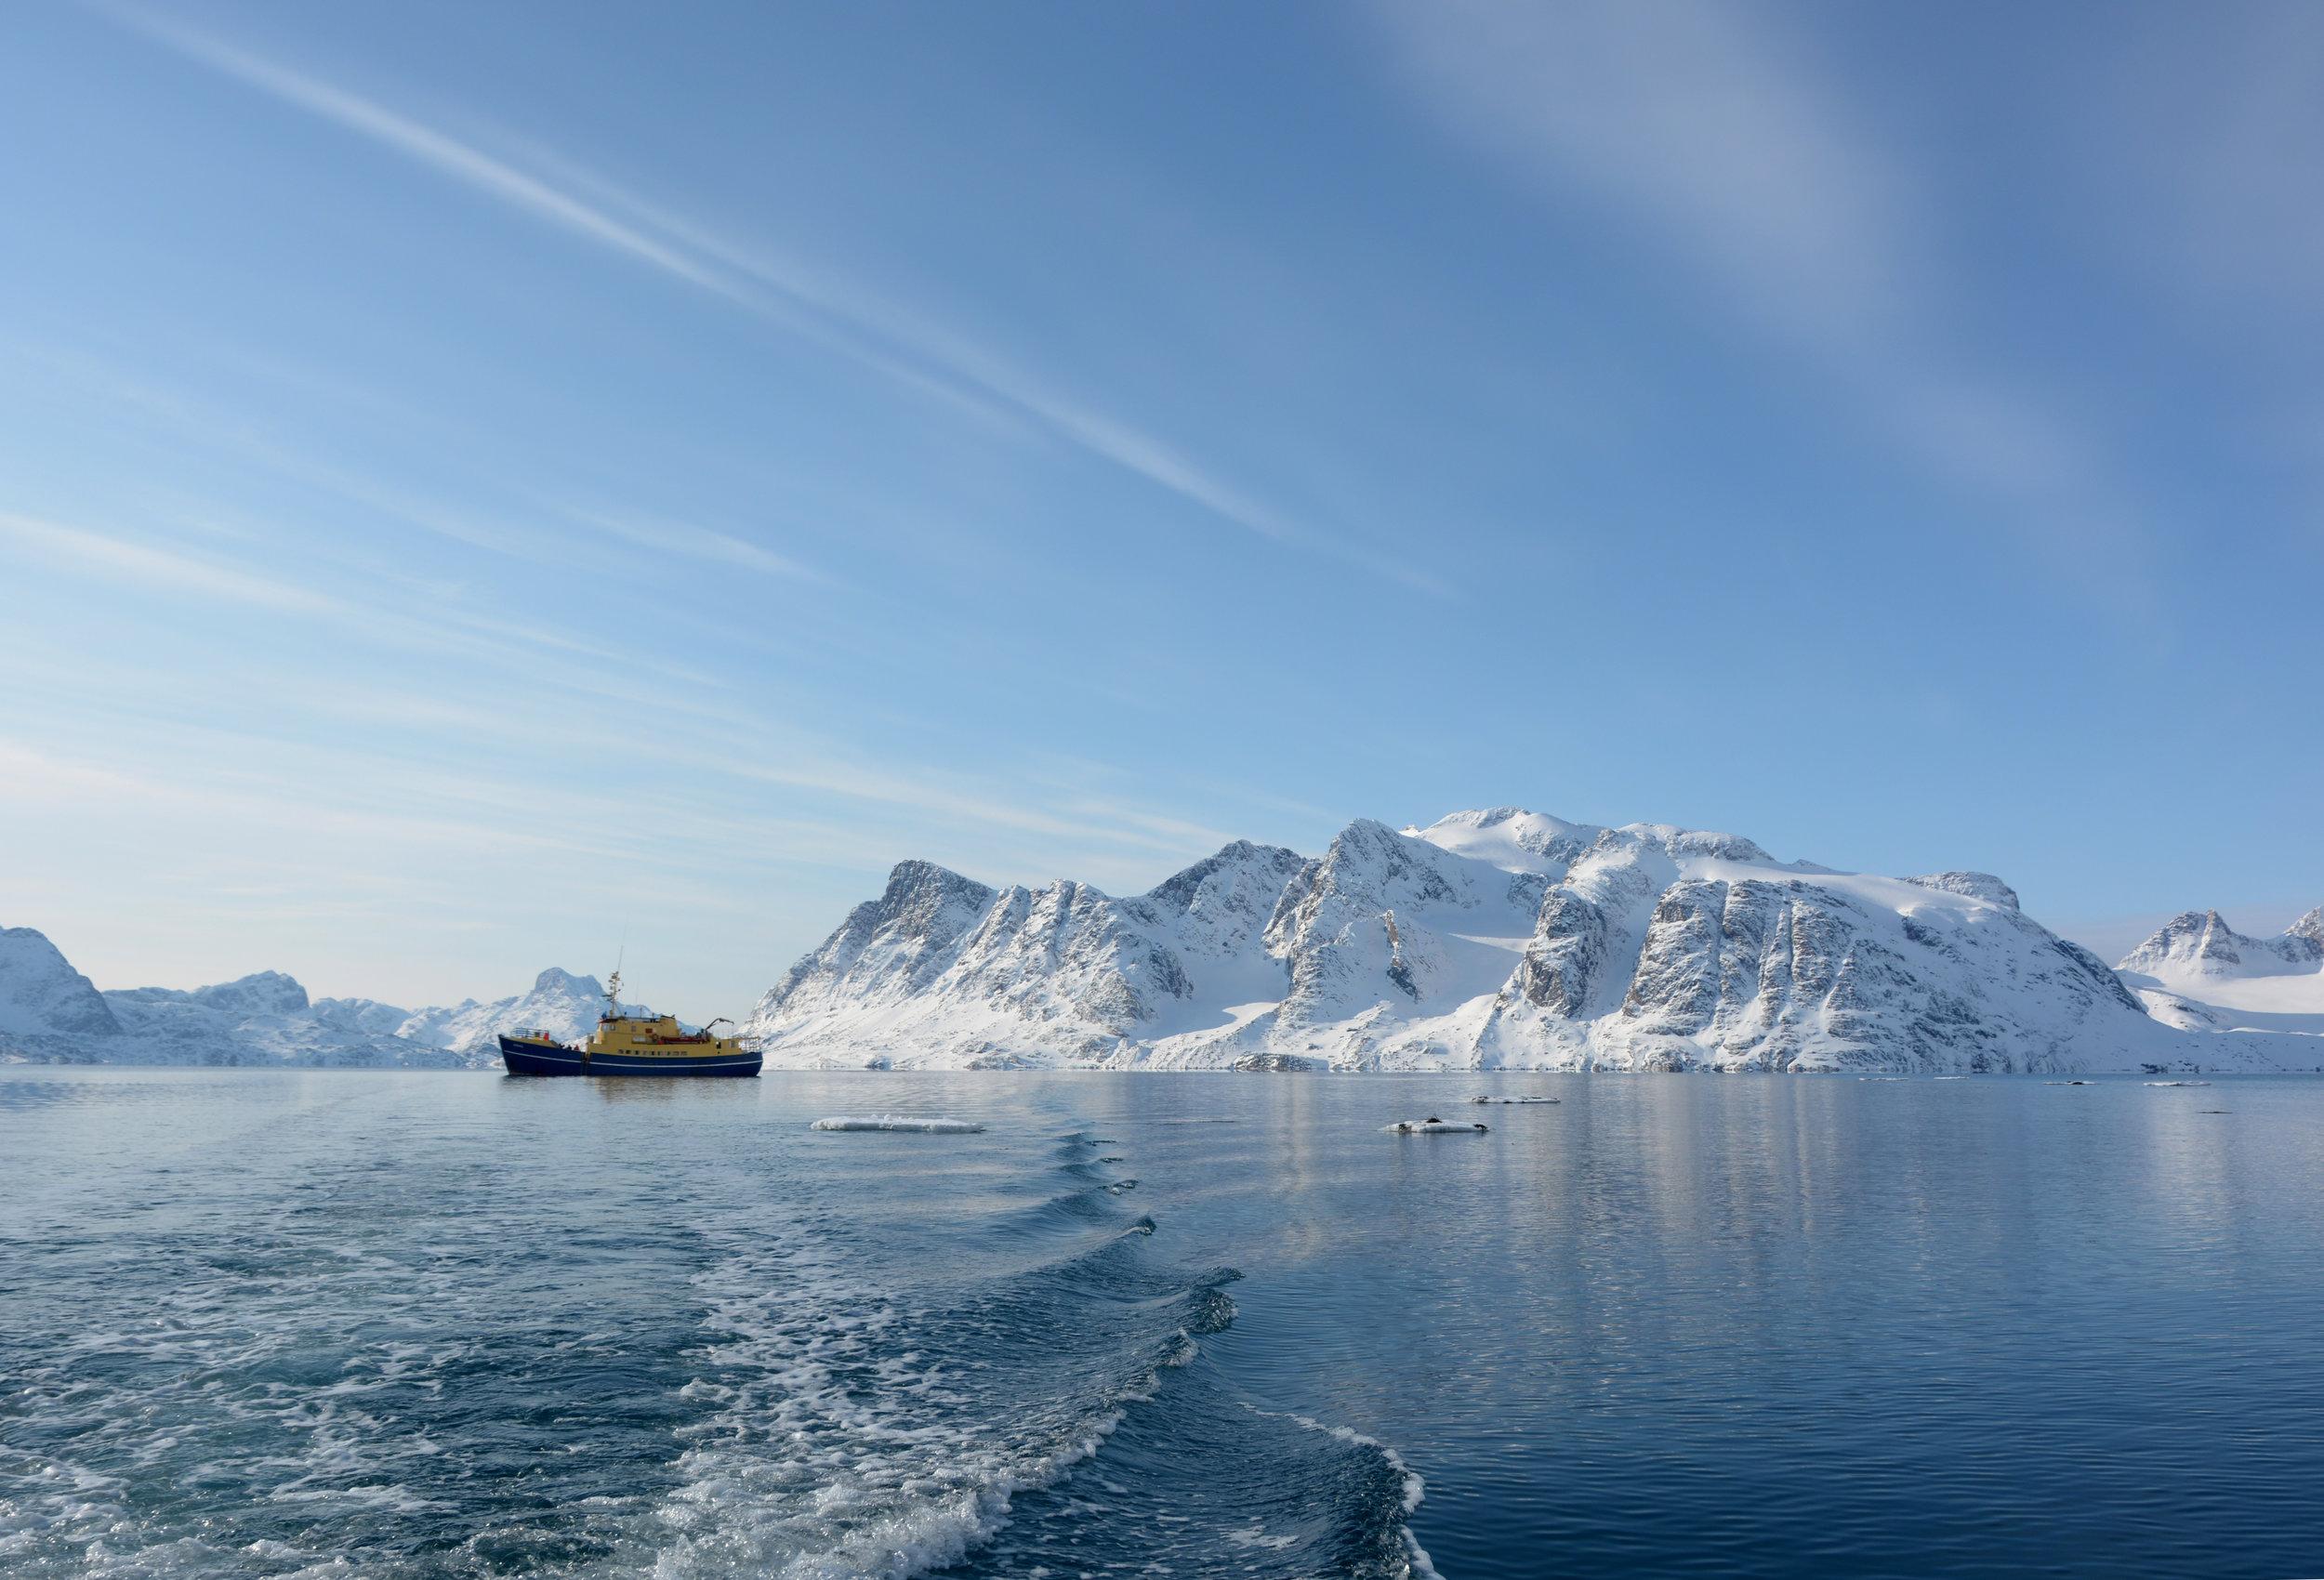 Powderbird-Greenland-Gallery-Images-Ship-Kisaq20.jpg